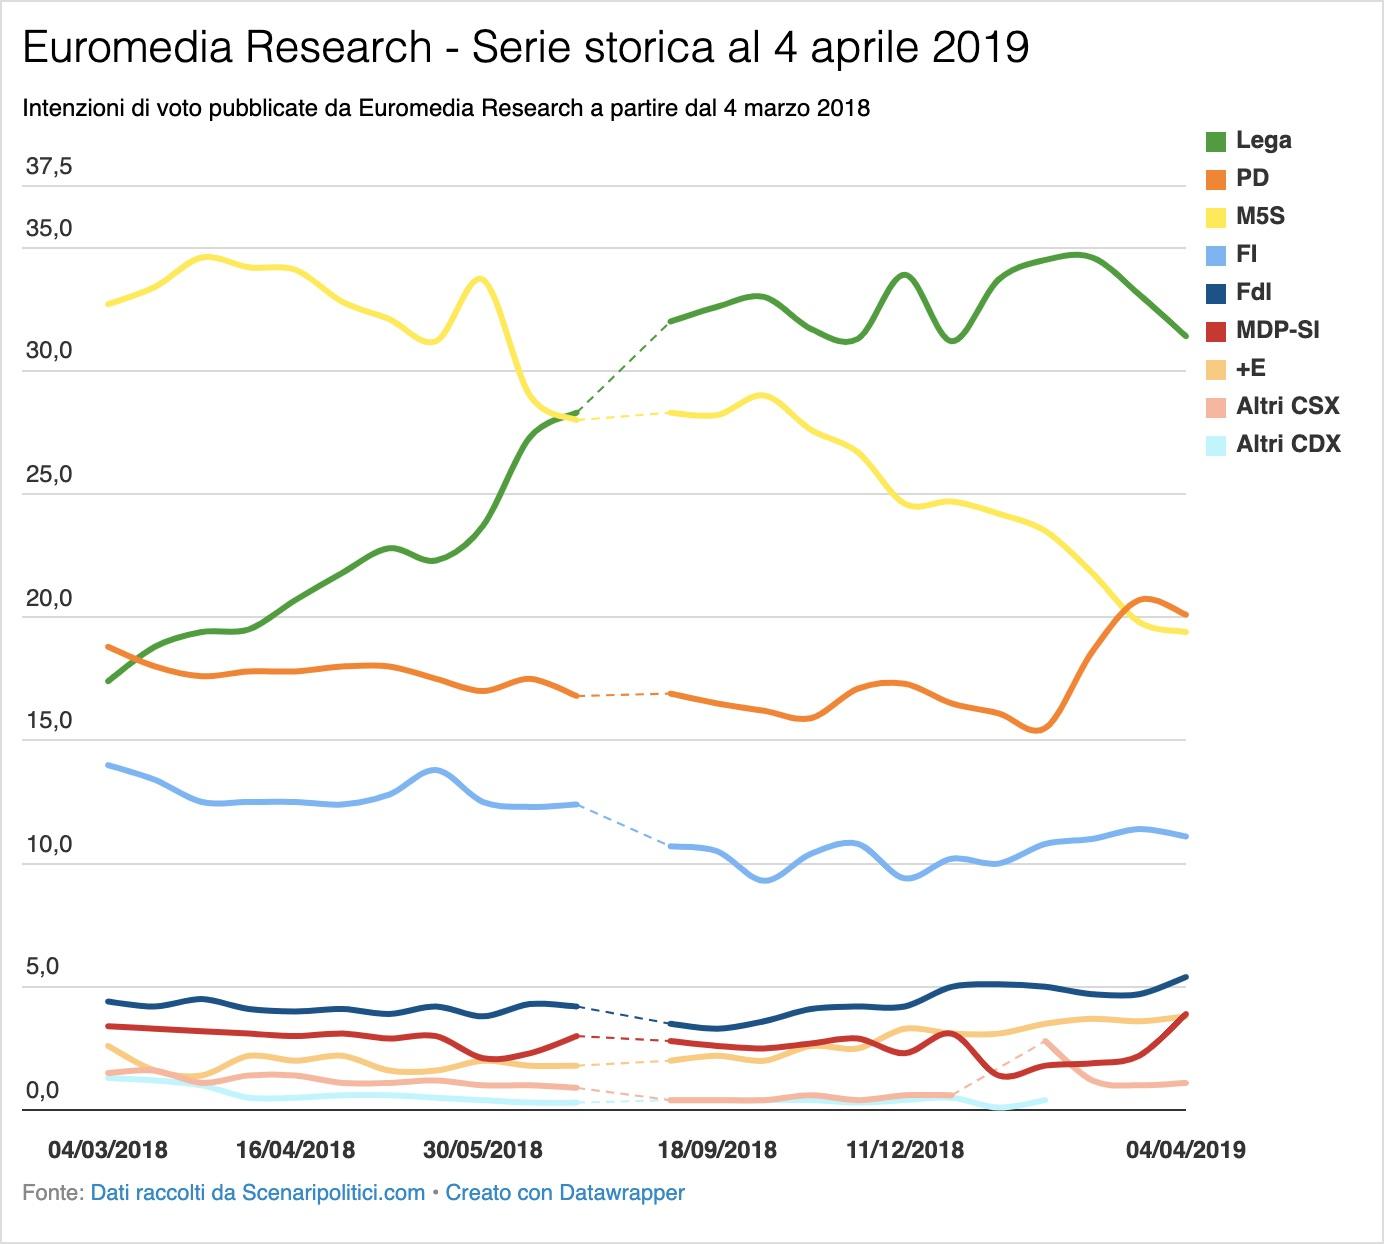 Sondaggi Euromedia Research e Piepoli 4 aprile 2019